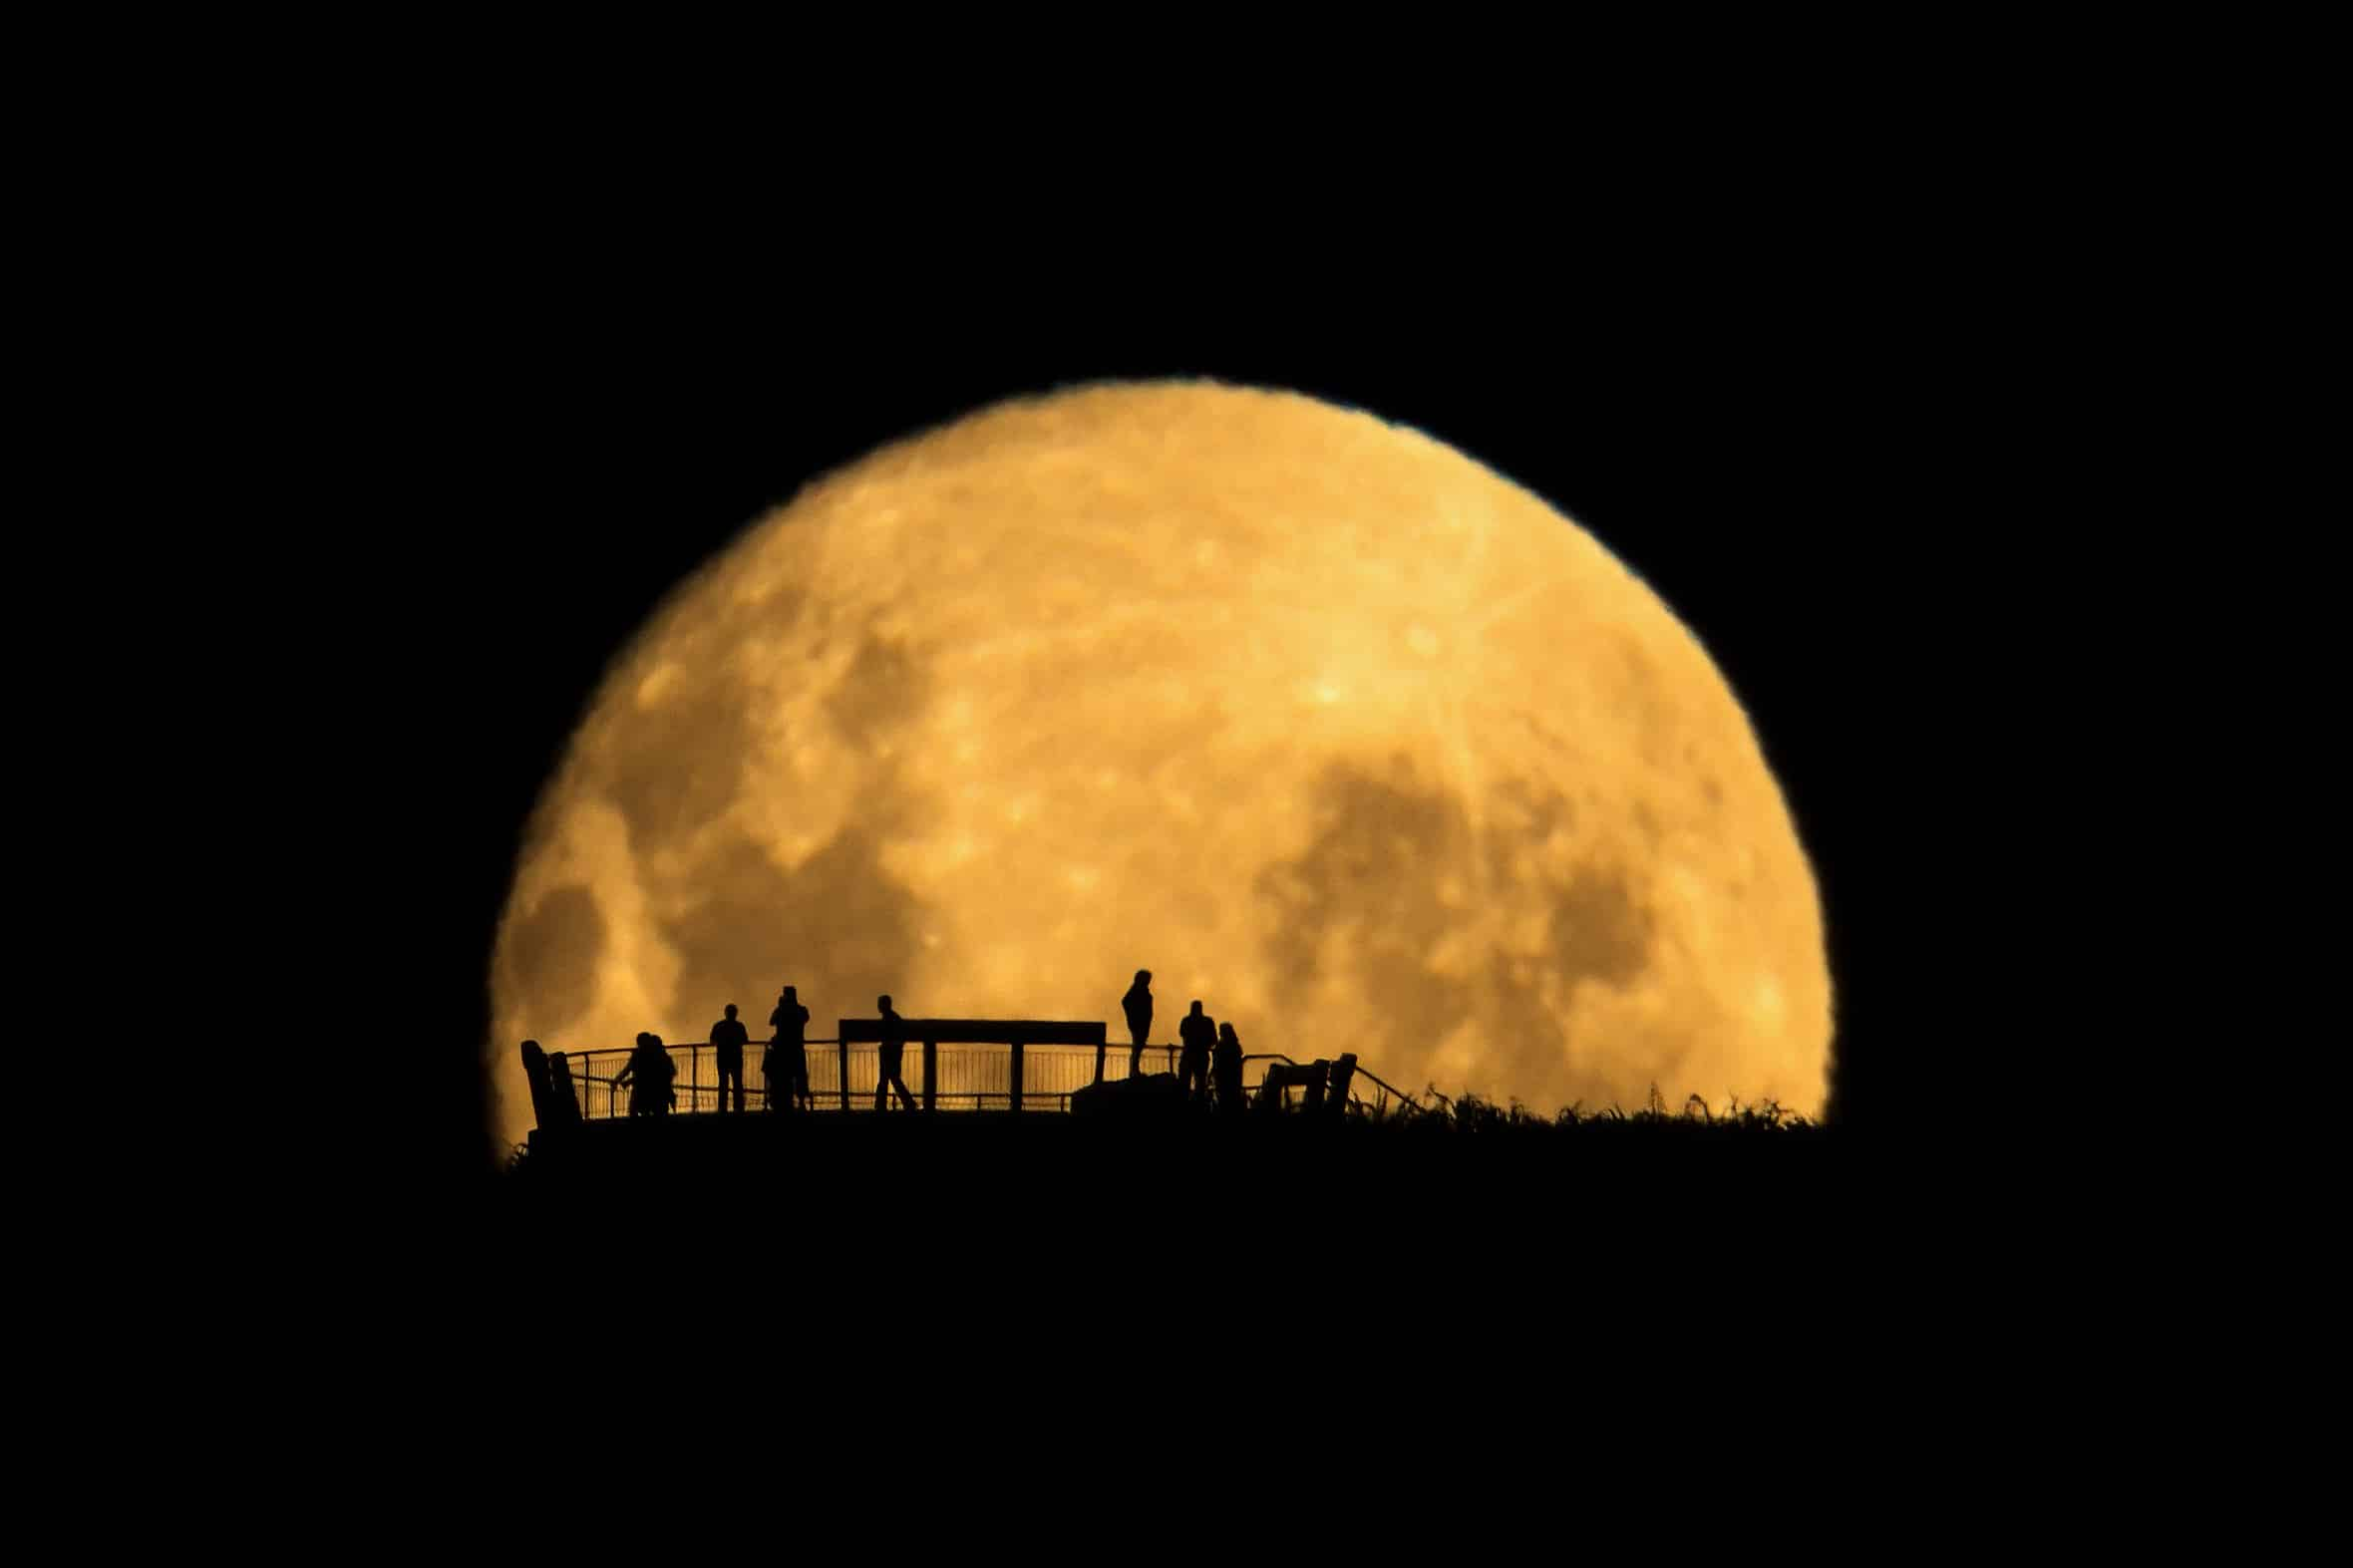 Moon-Silhouettes-MAGE001-.jpg